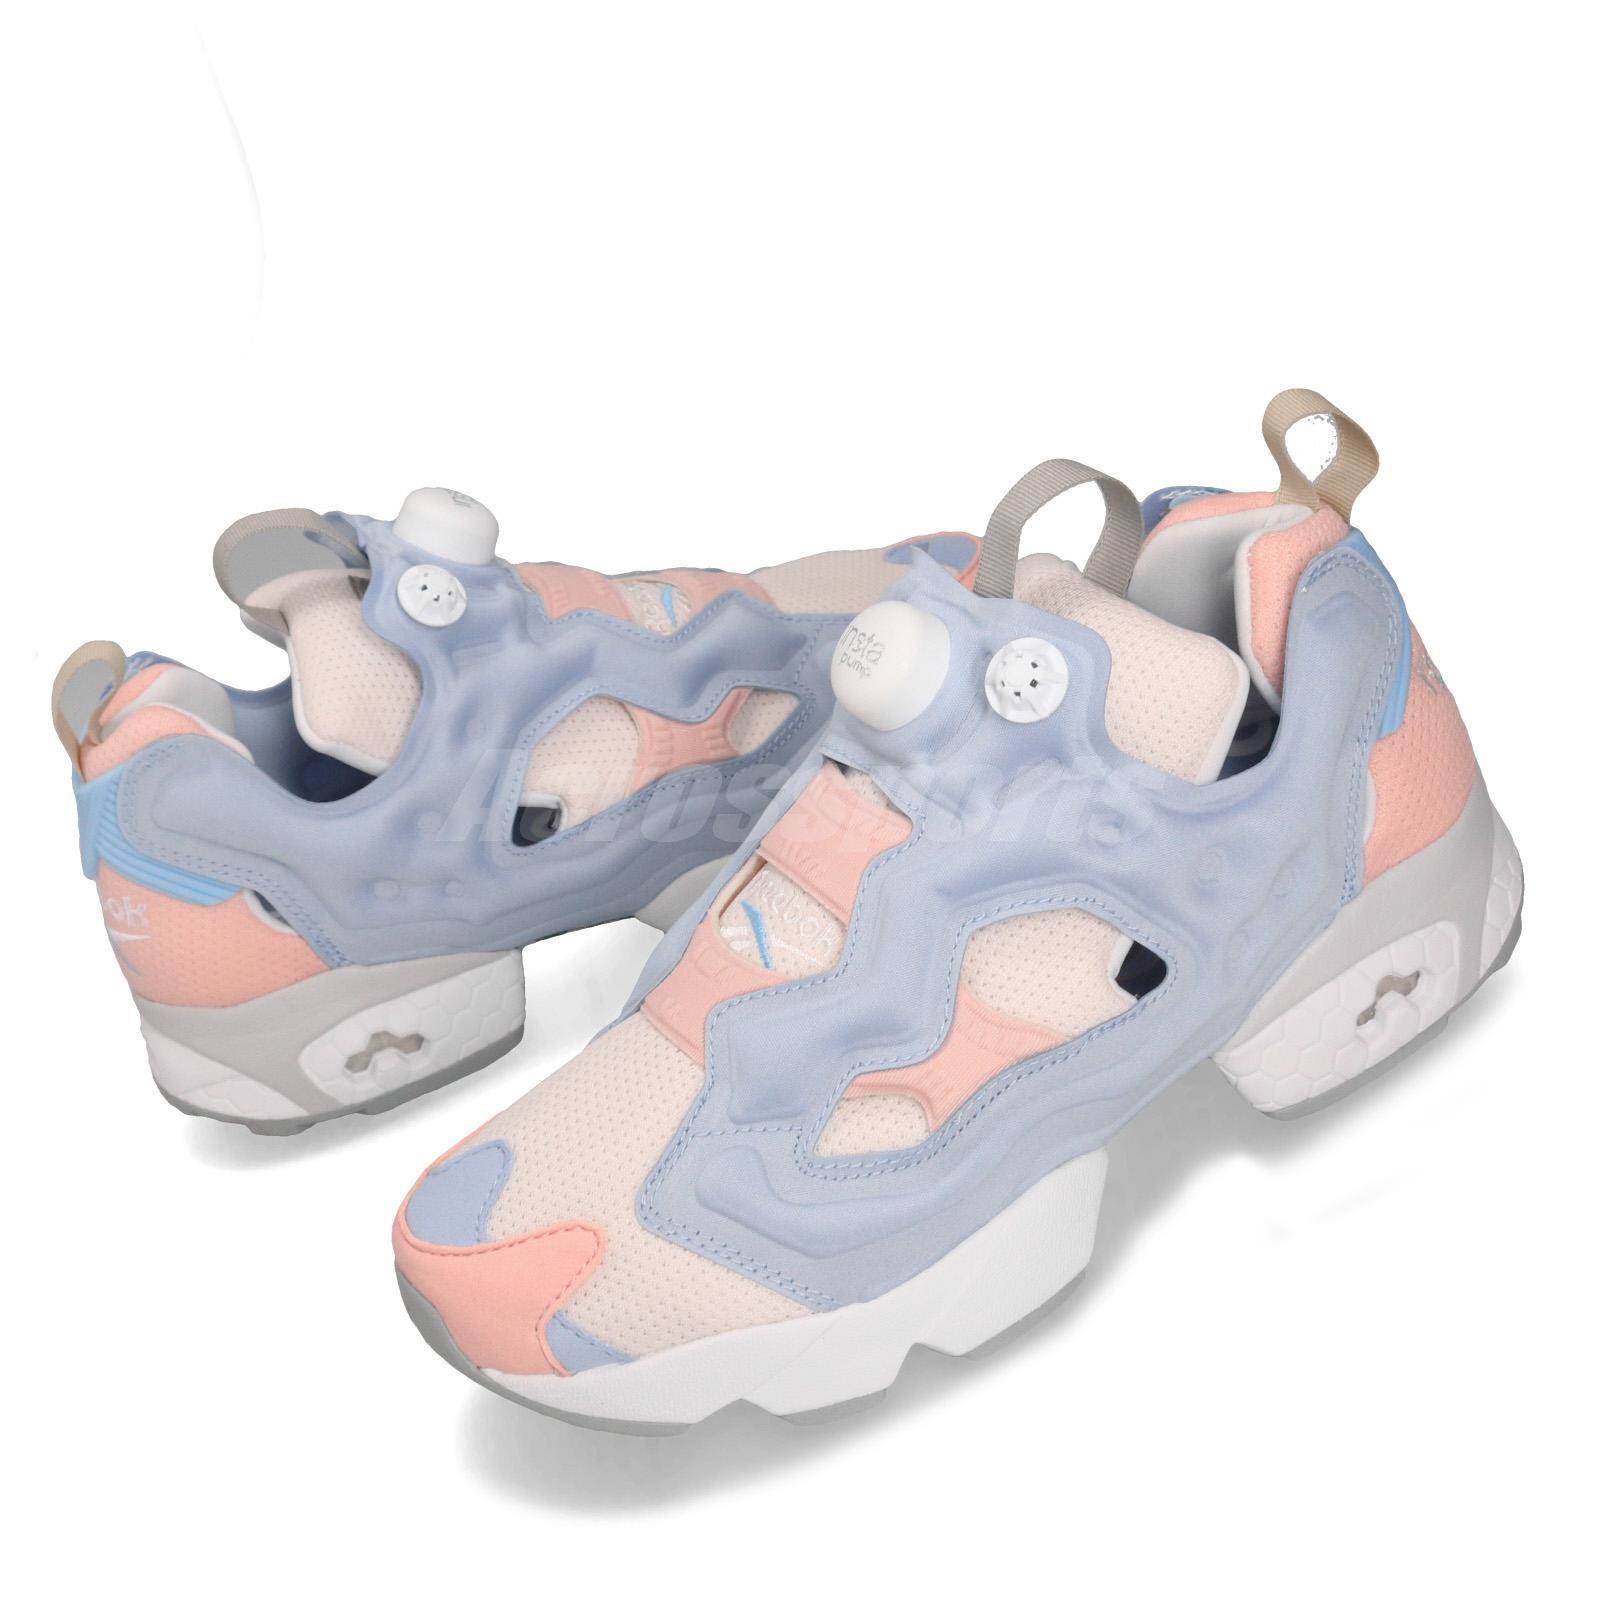 Reebok Insta Pump Fury OG Pink Blue White Men Running Shoes Sneakers EH0975